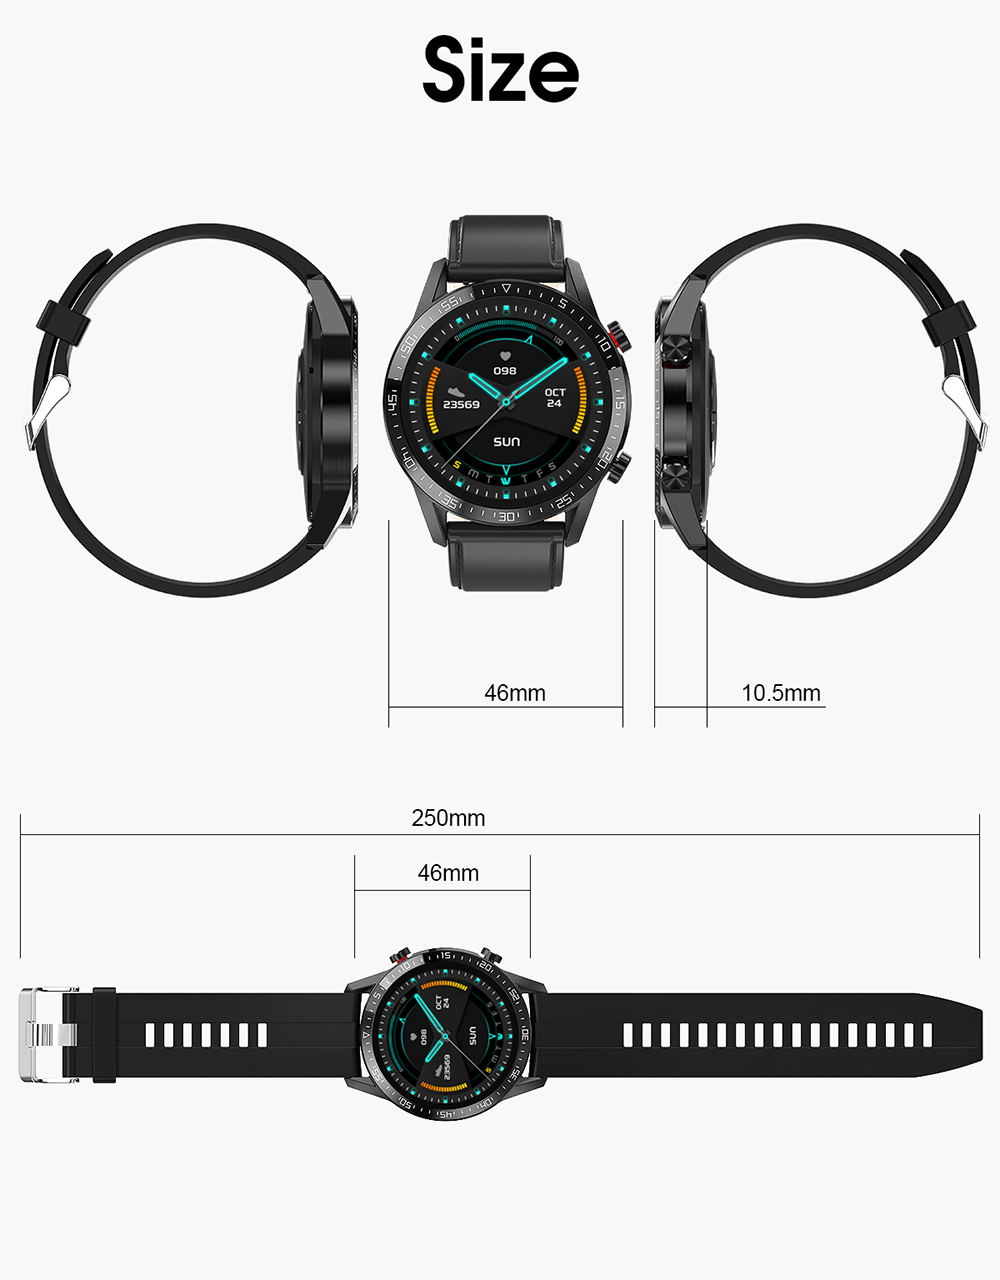 H4bfdd49cc39b40478eaccd50272b115am For Phone Xiaomi Android IOS Reloj Inteligente Hombre Smartwatch Men 2021 Android IP68 Smartwatch Answer Call Smart Watch Man